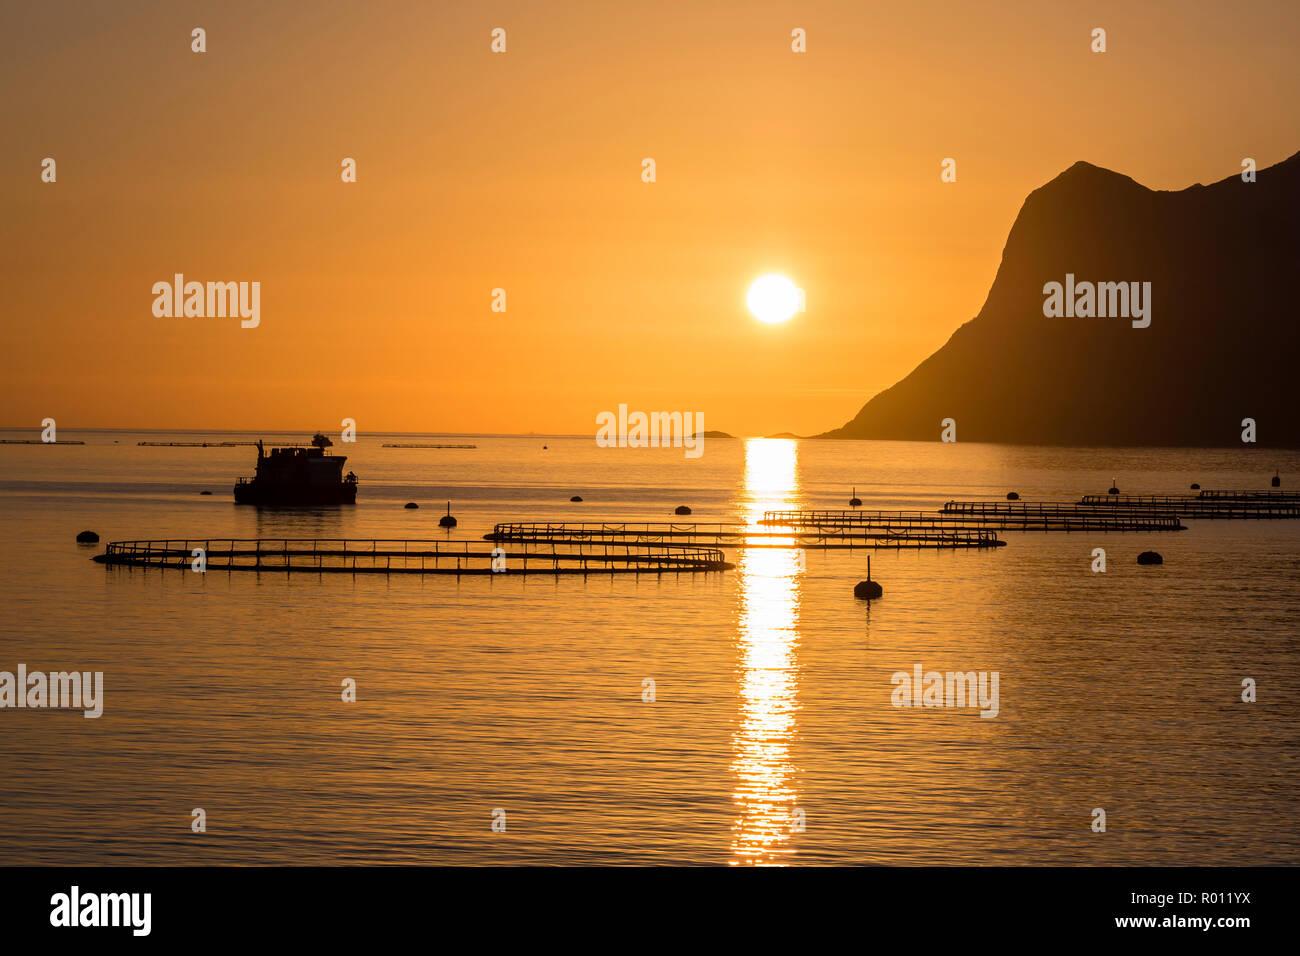 salmon-farm-in-fjord-mefjord-sunset-over